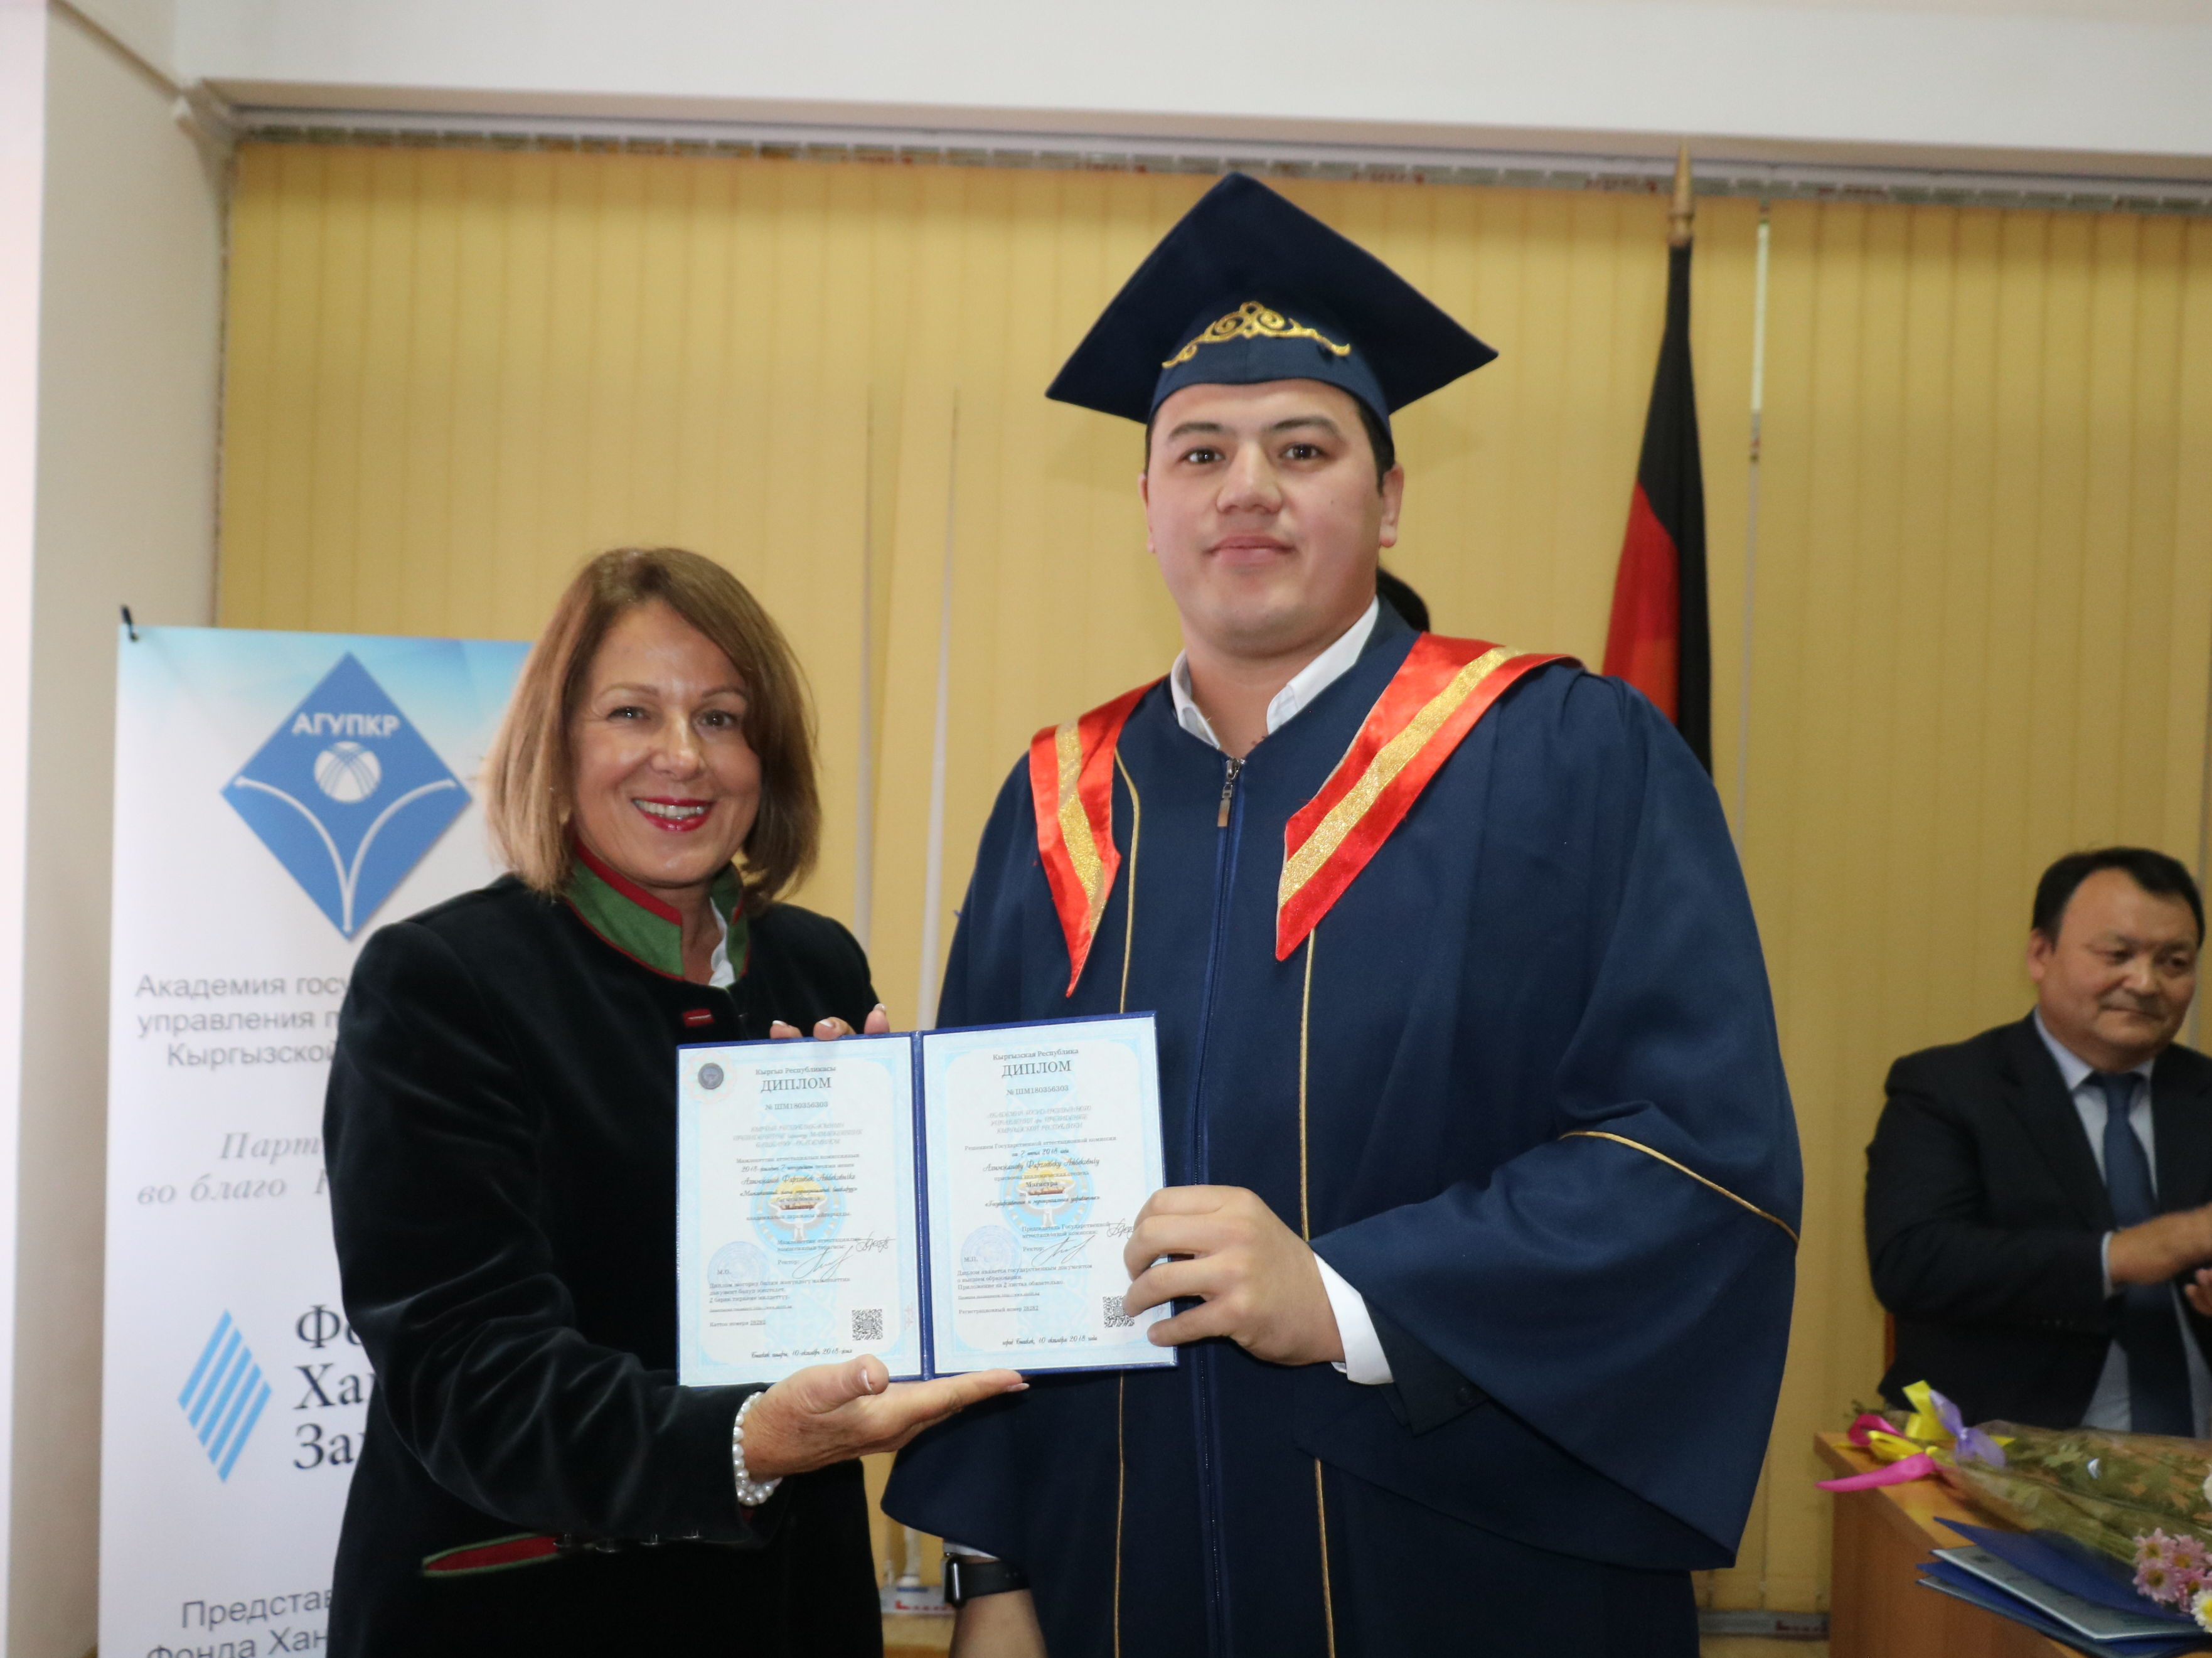 Der Übergabe der Diplome